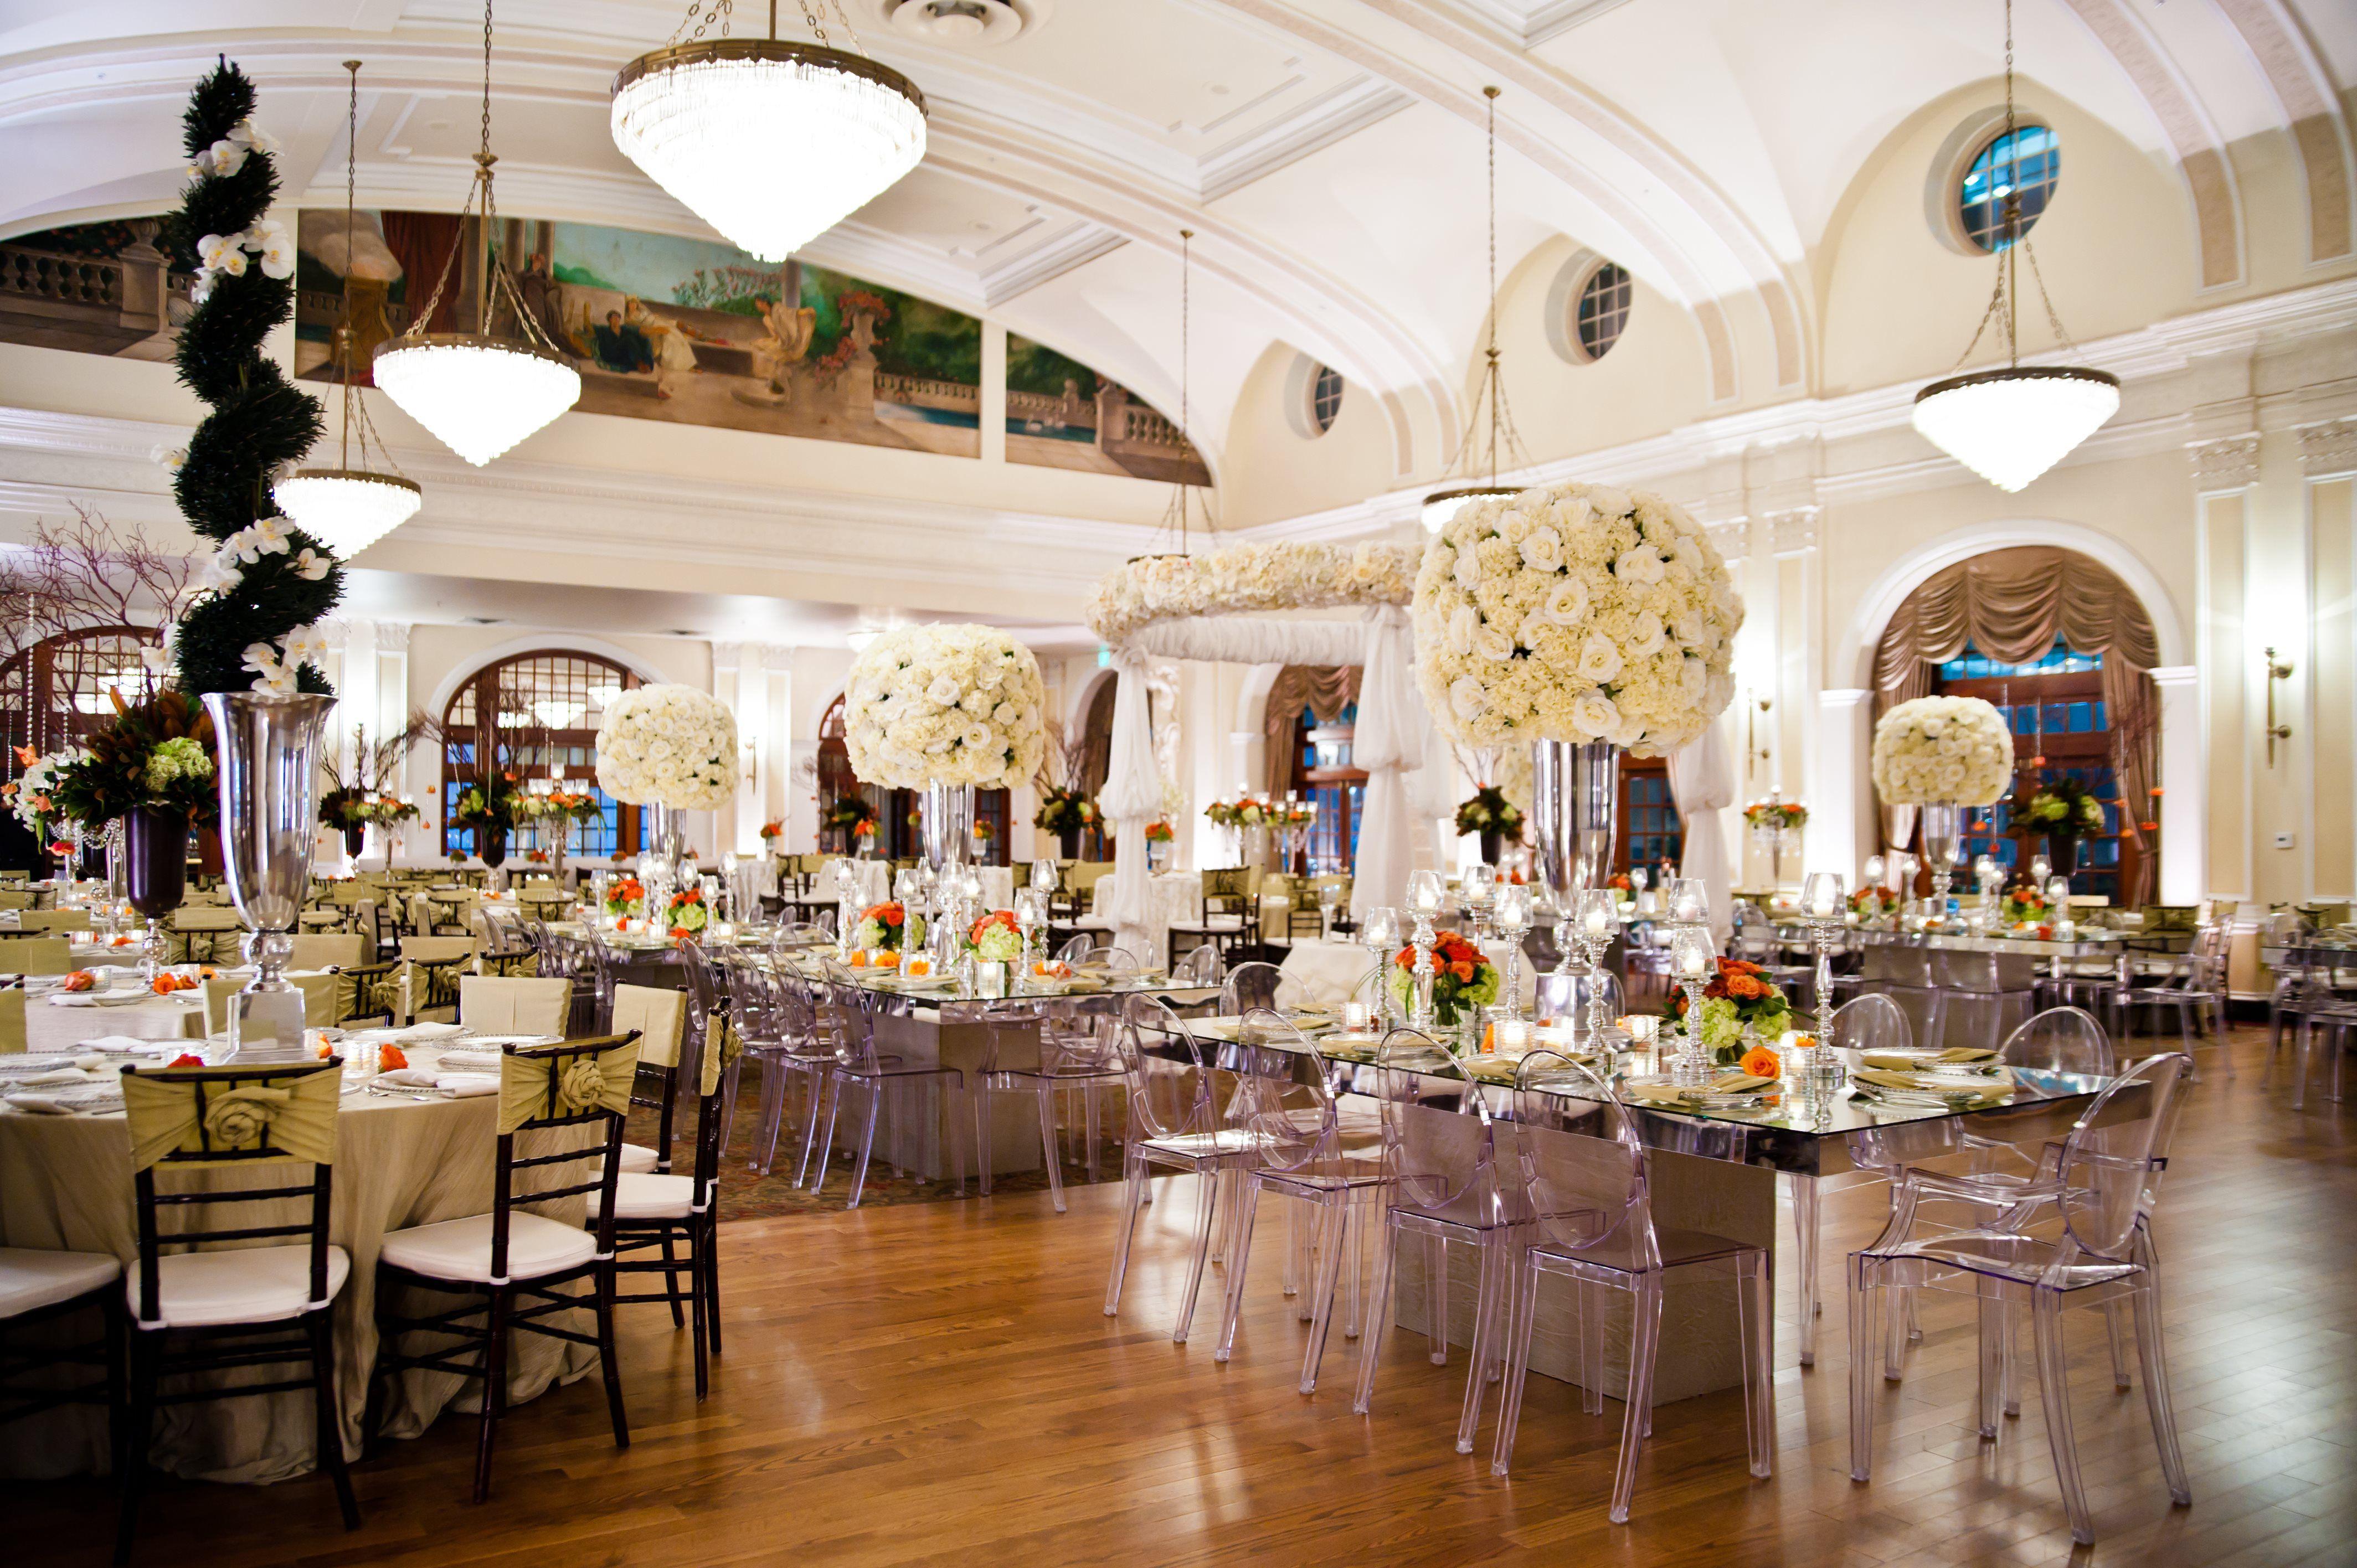 Houston party event and wedding reception venue crystal ballroom crystal ballroom junglespirit Image collections